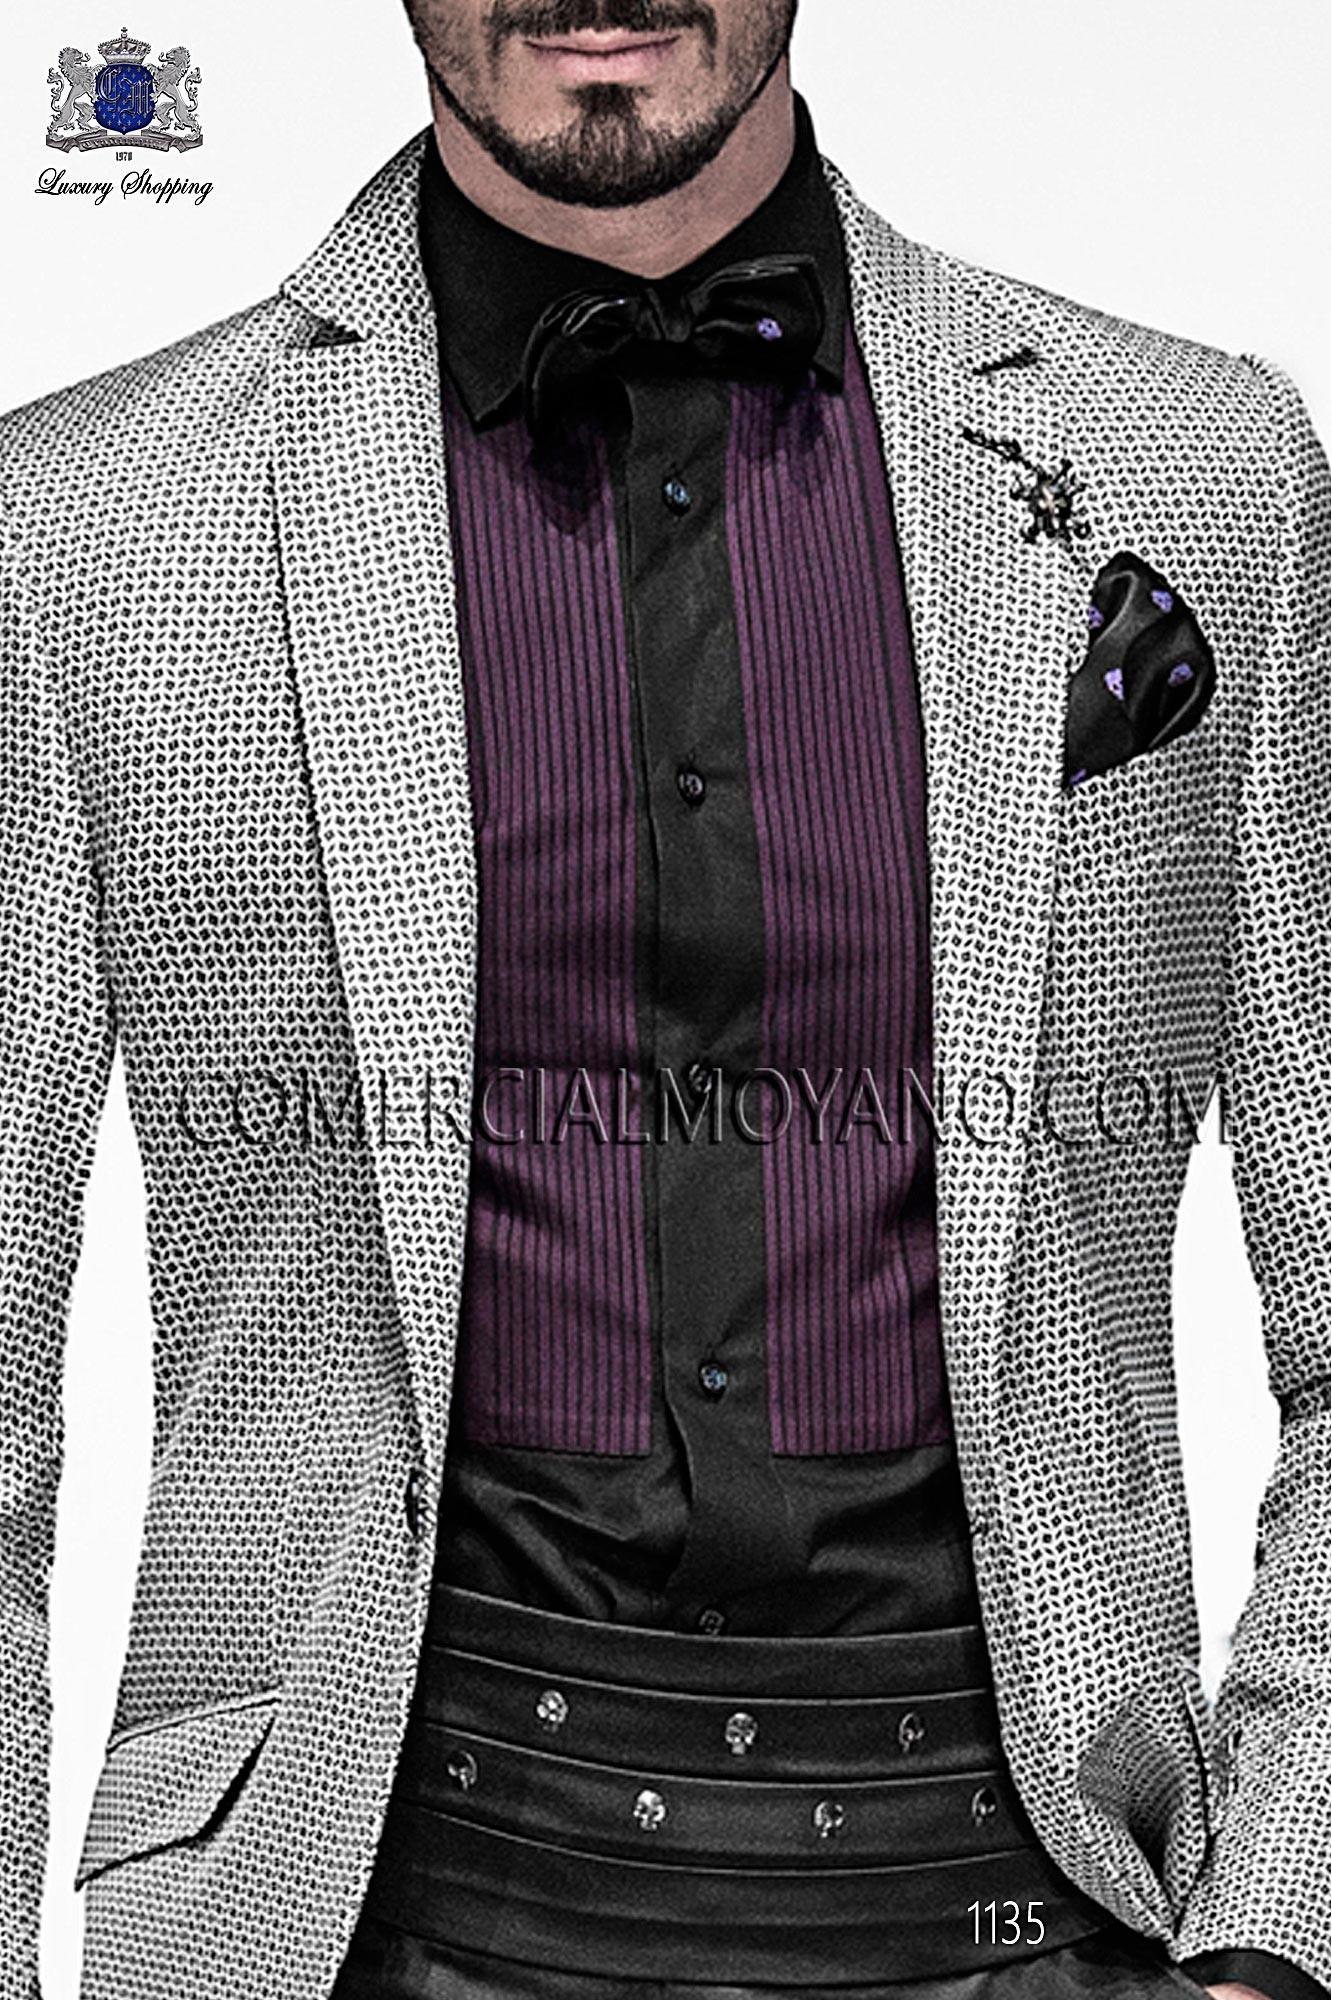 Italian emotion gray men wedding suit, model: 1135 Ottavio Nuccio Gala Emotion Collection